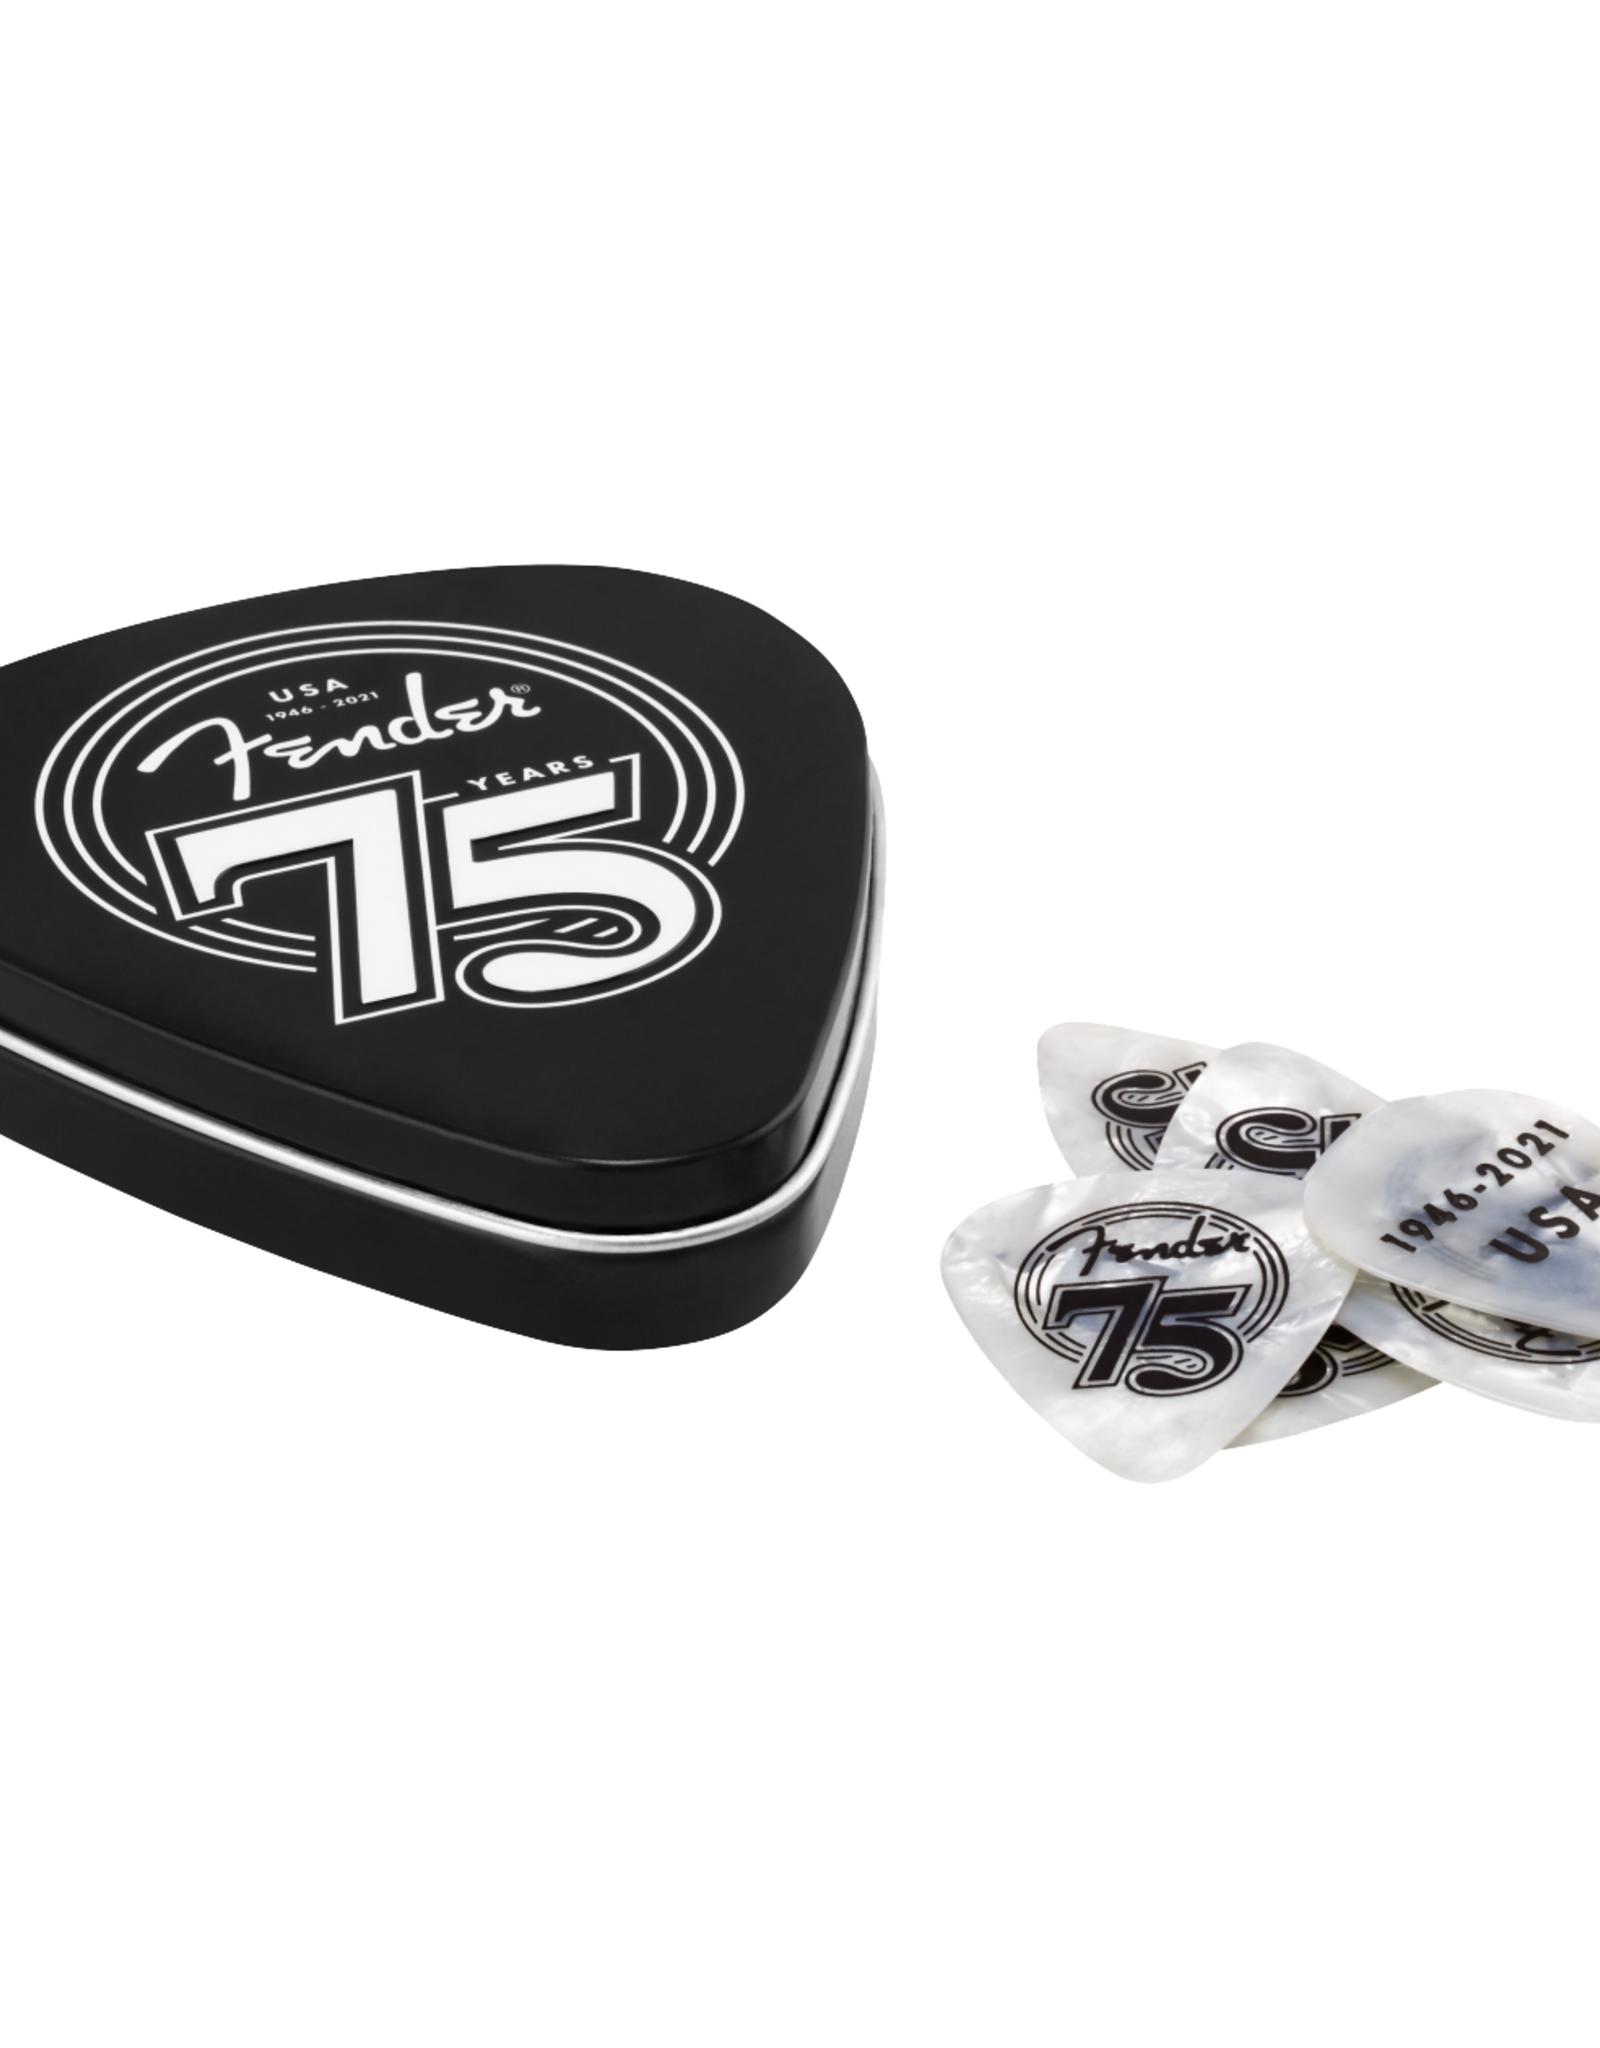 Fender Fender 75th Anniversary Pick Tin, 18 Count